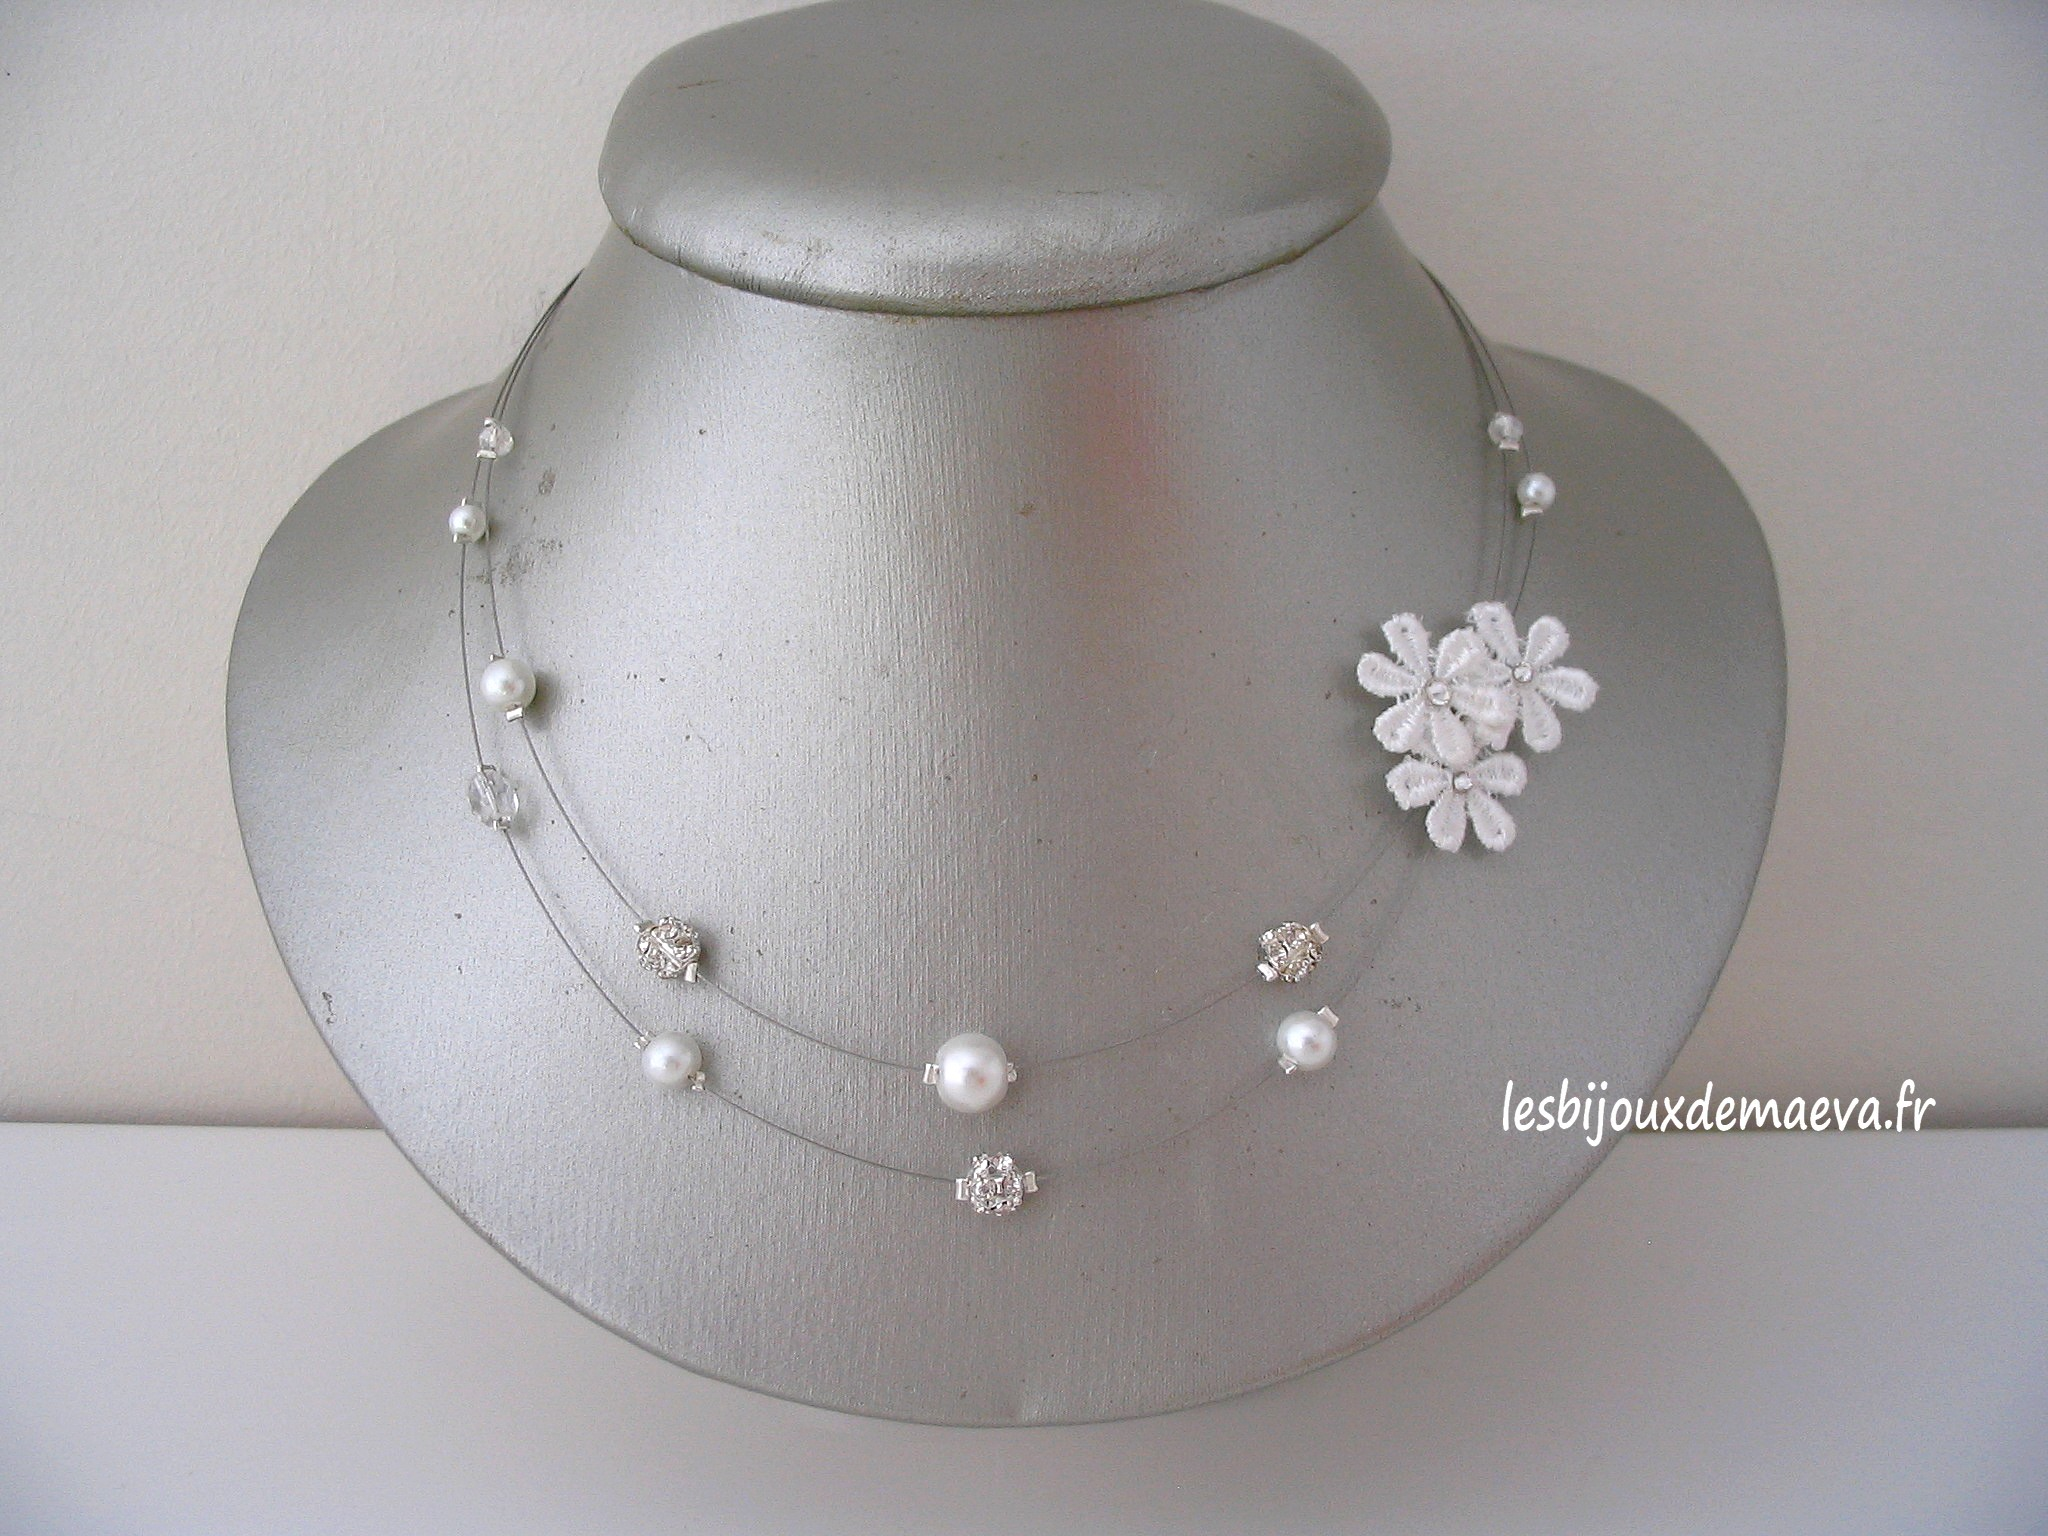 collier mariage blanc dentelle et perles sentimentale. Black Bedroom Furniture Sets. Home Design Ideas